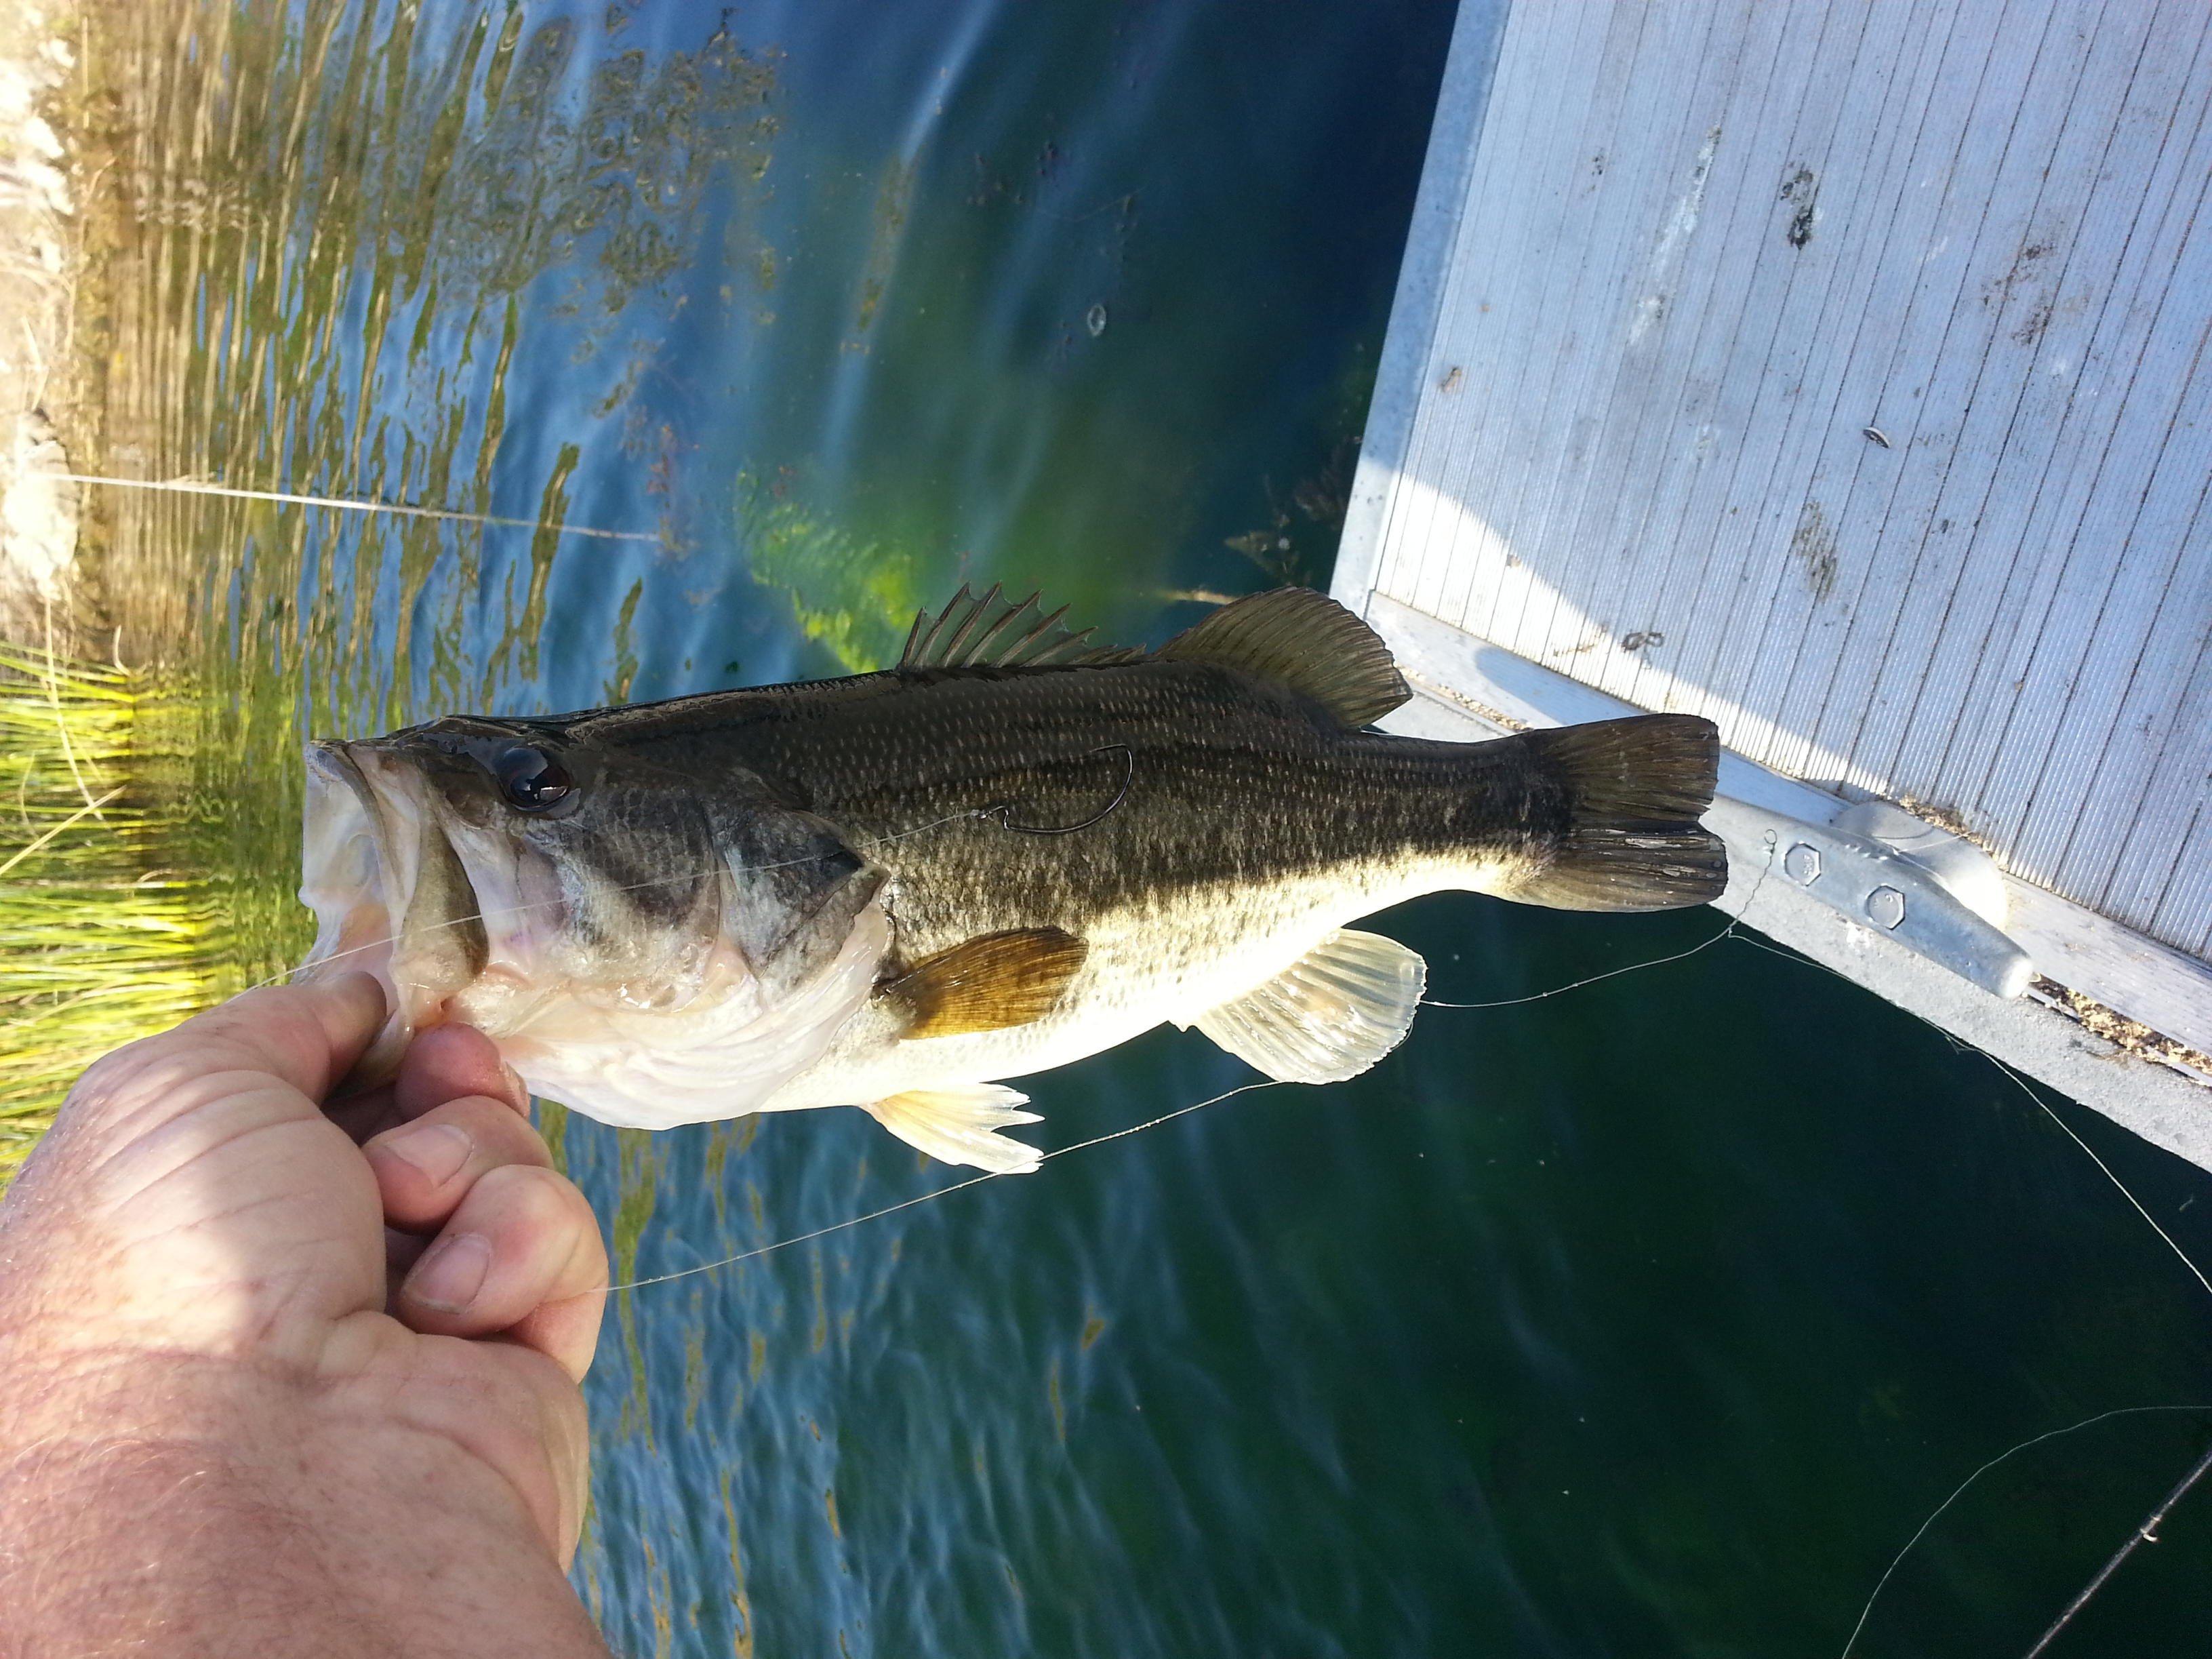 Click image for larger version  Name:bass 3-18-14 dixon lake #4.jpg Views:307 Size:807.5 KB ID:51657